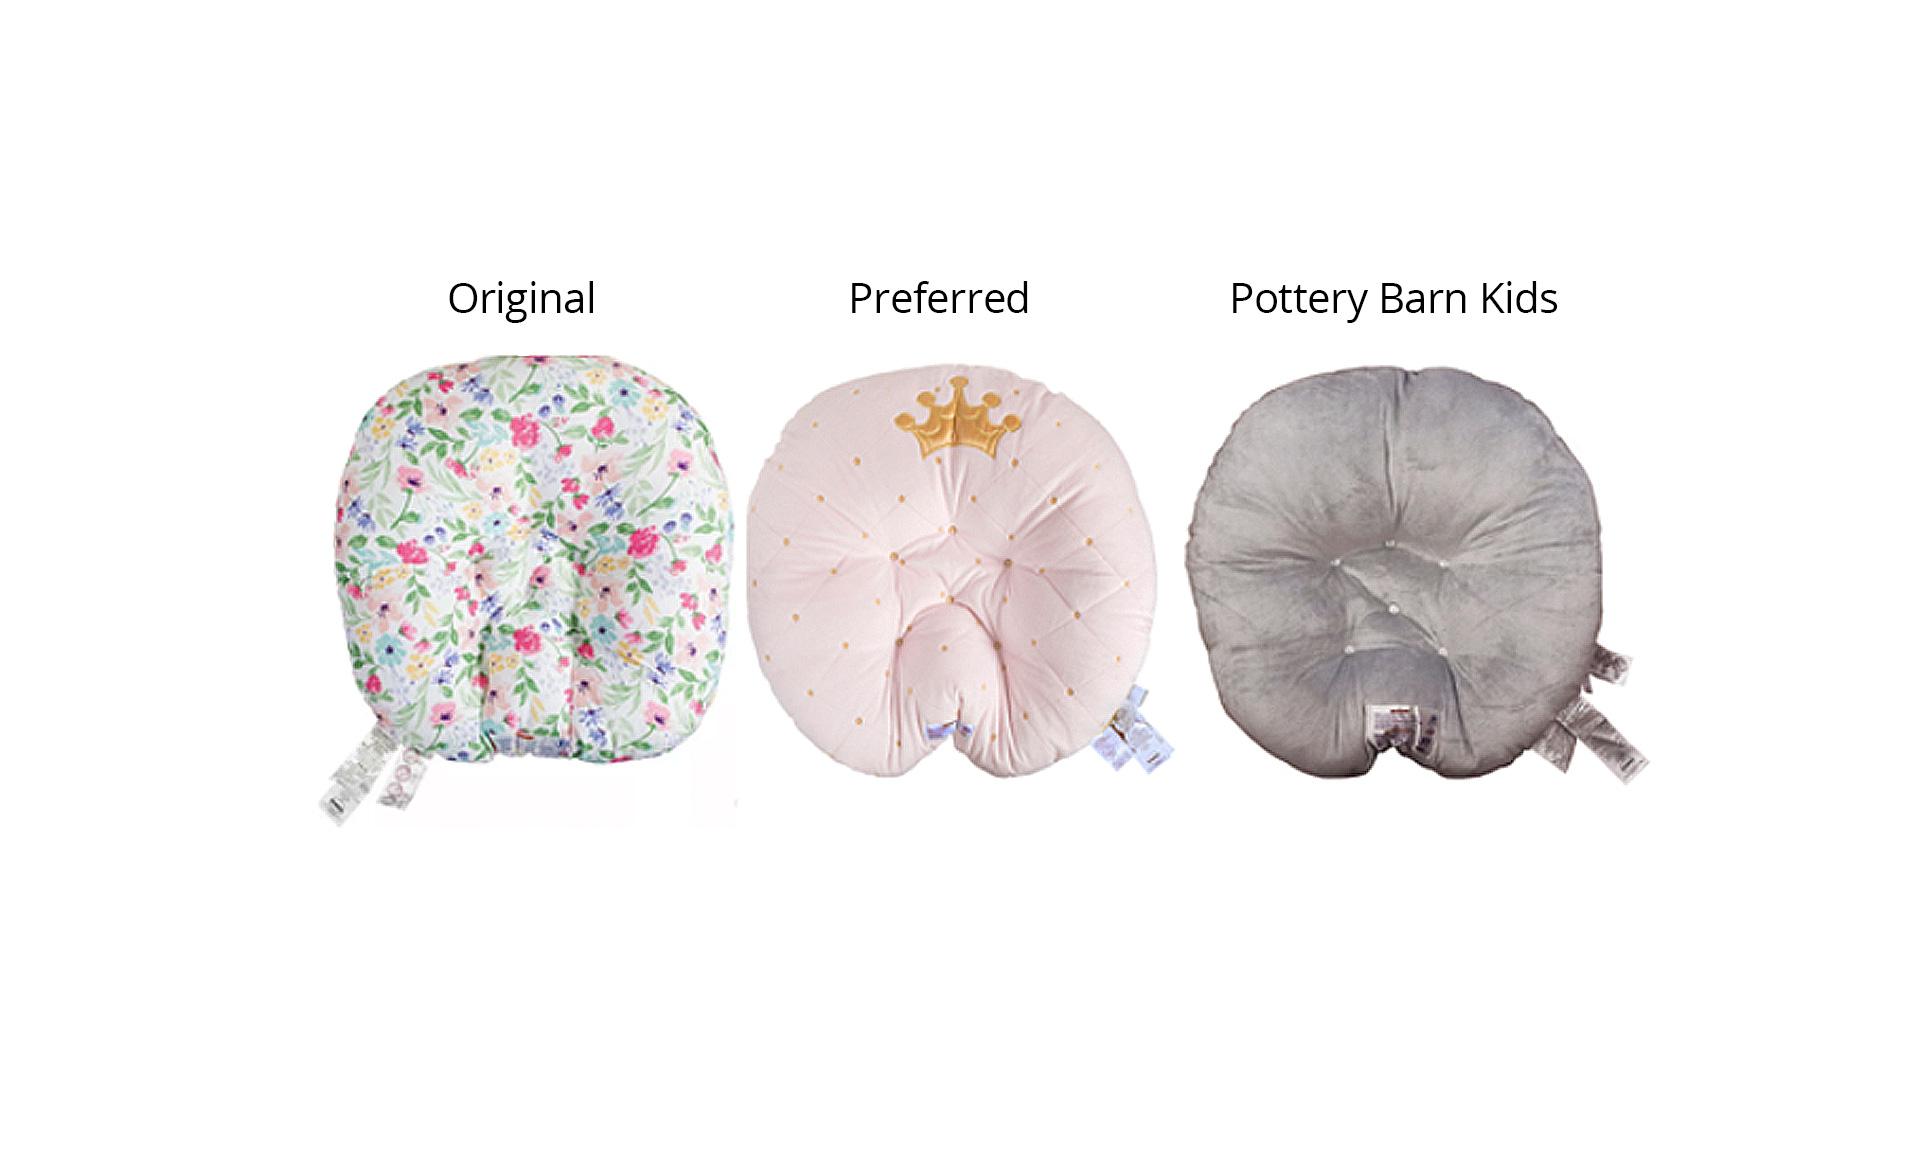 Comparison of different newborn lounger pillows